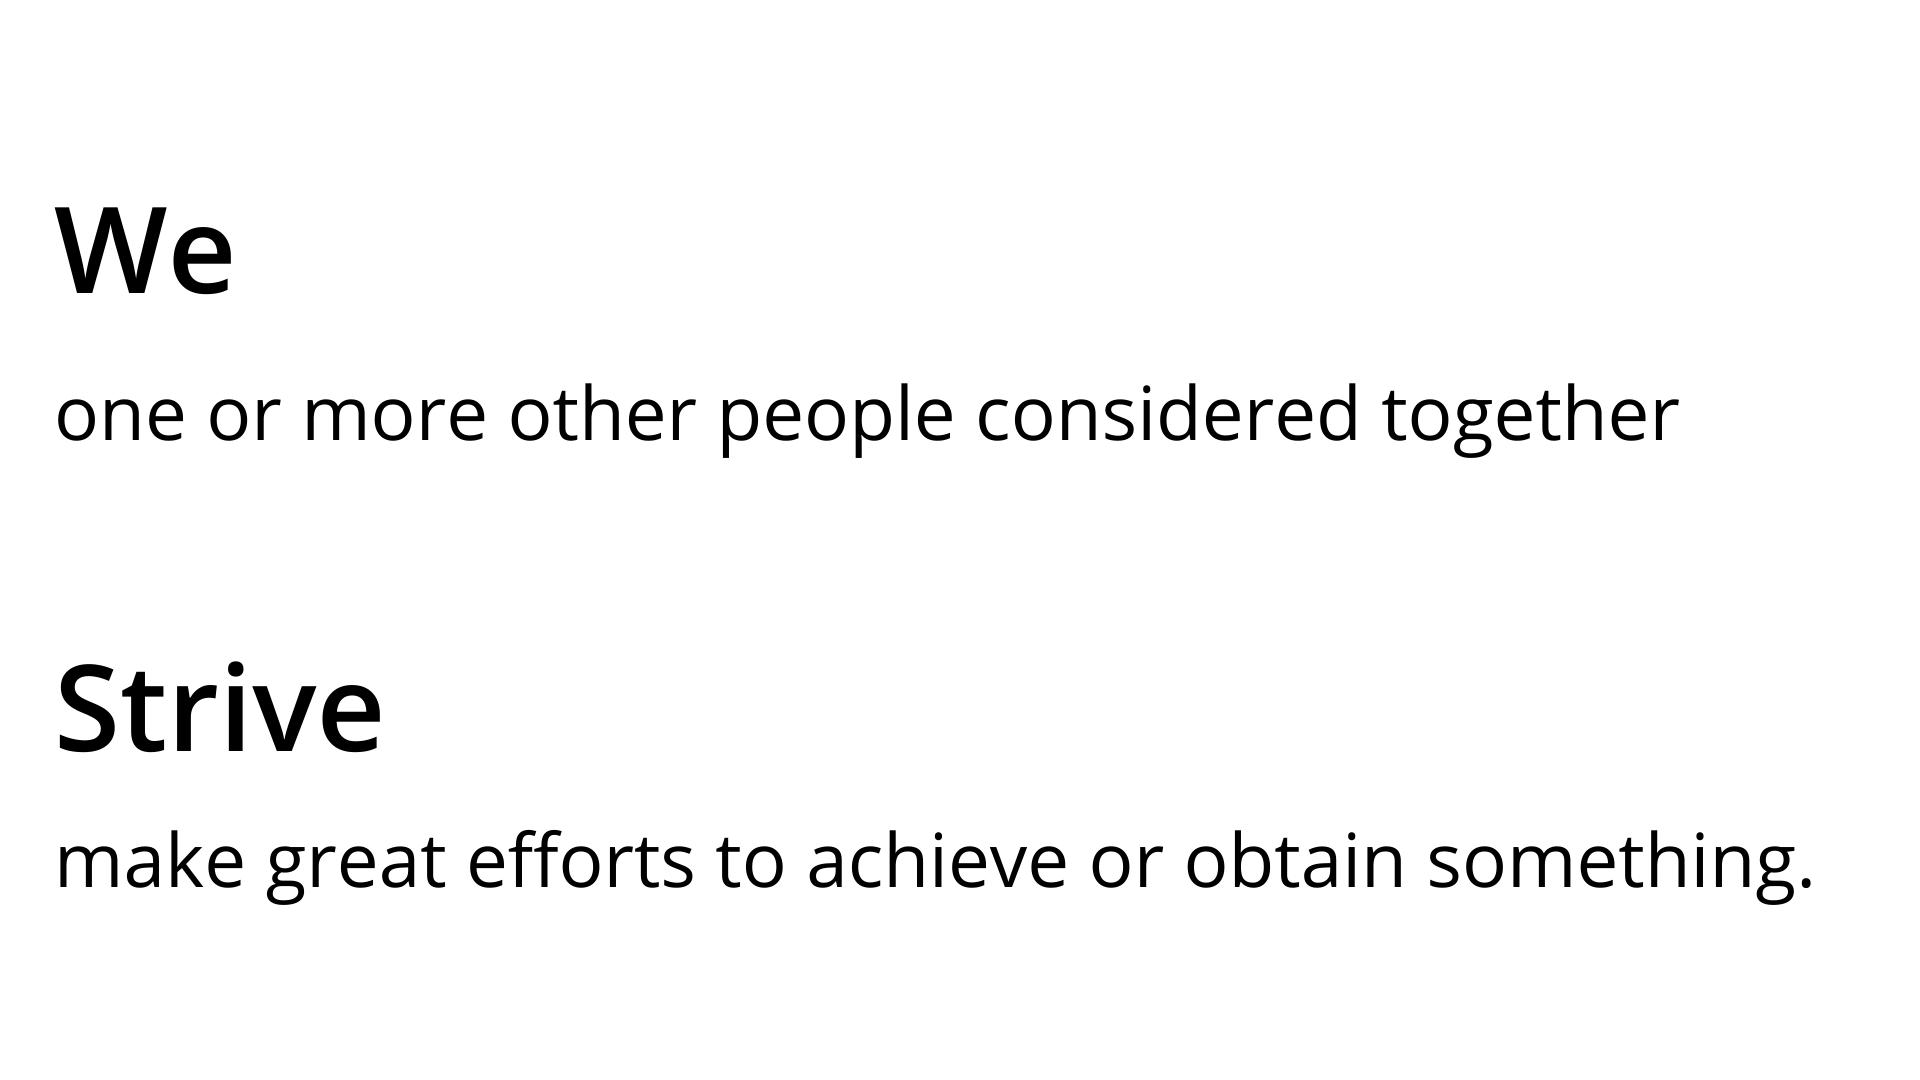 WeStrive definition